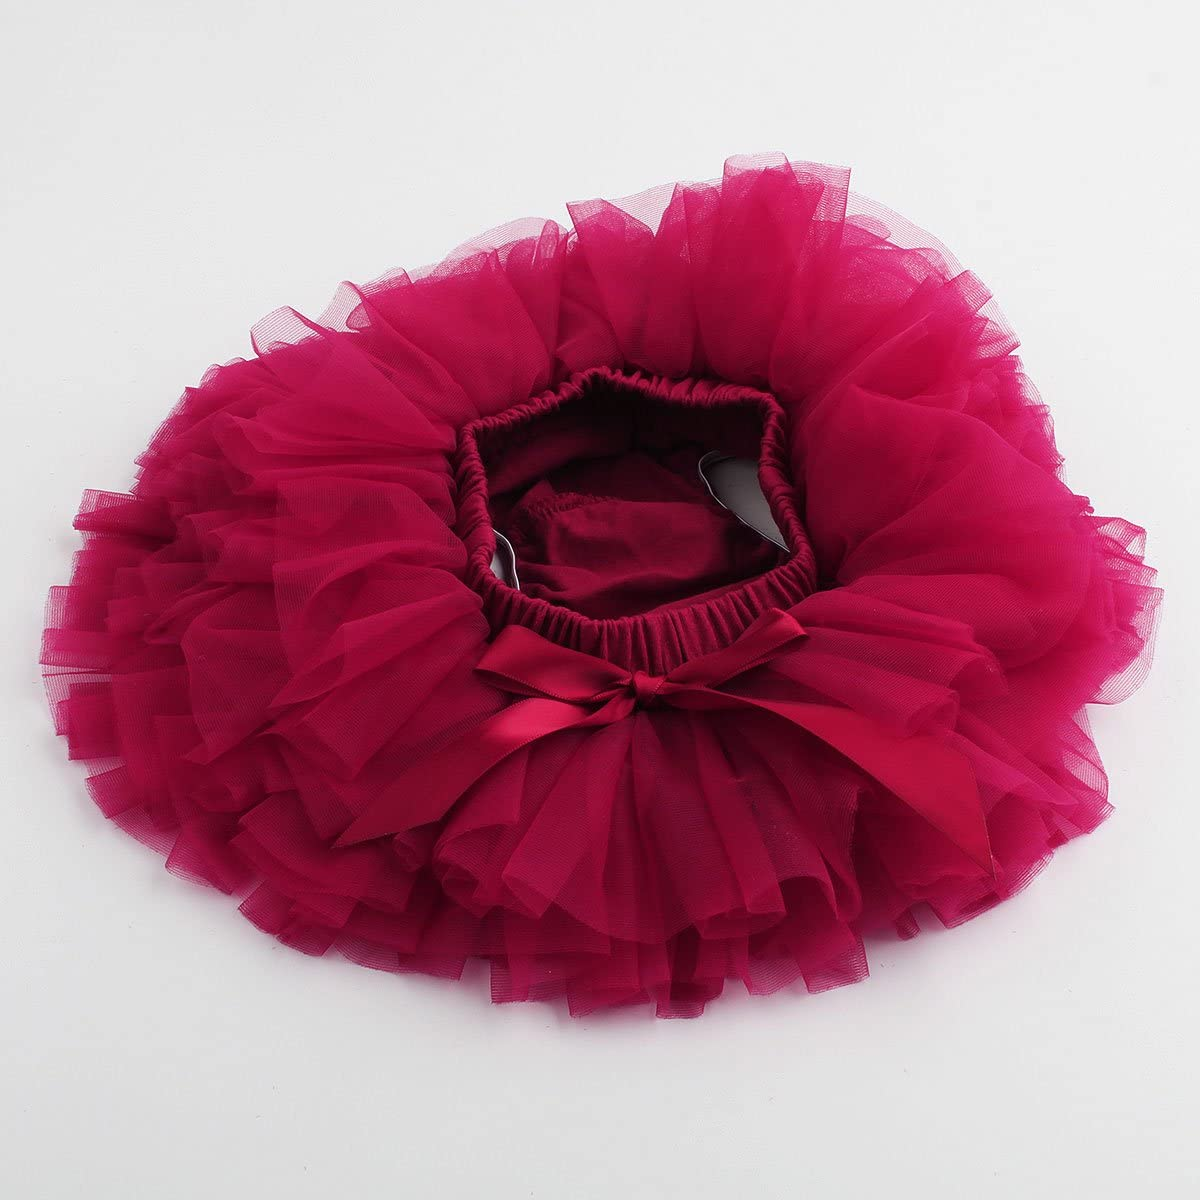 0 to 36 Months Slowera Baby Girls Soft Tutu Skirt Skorts